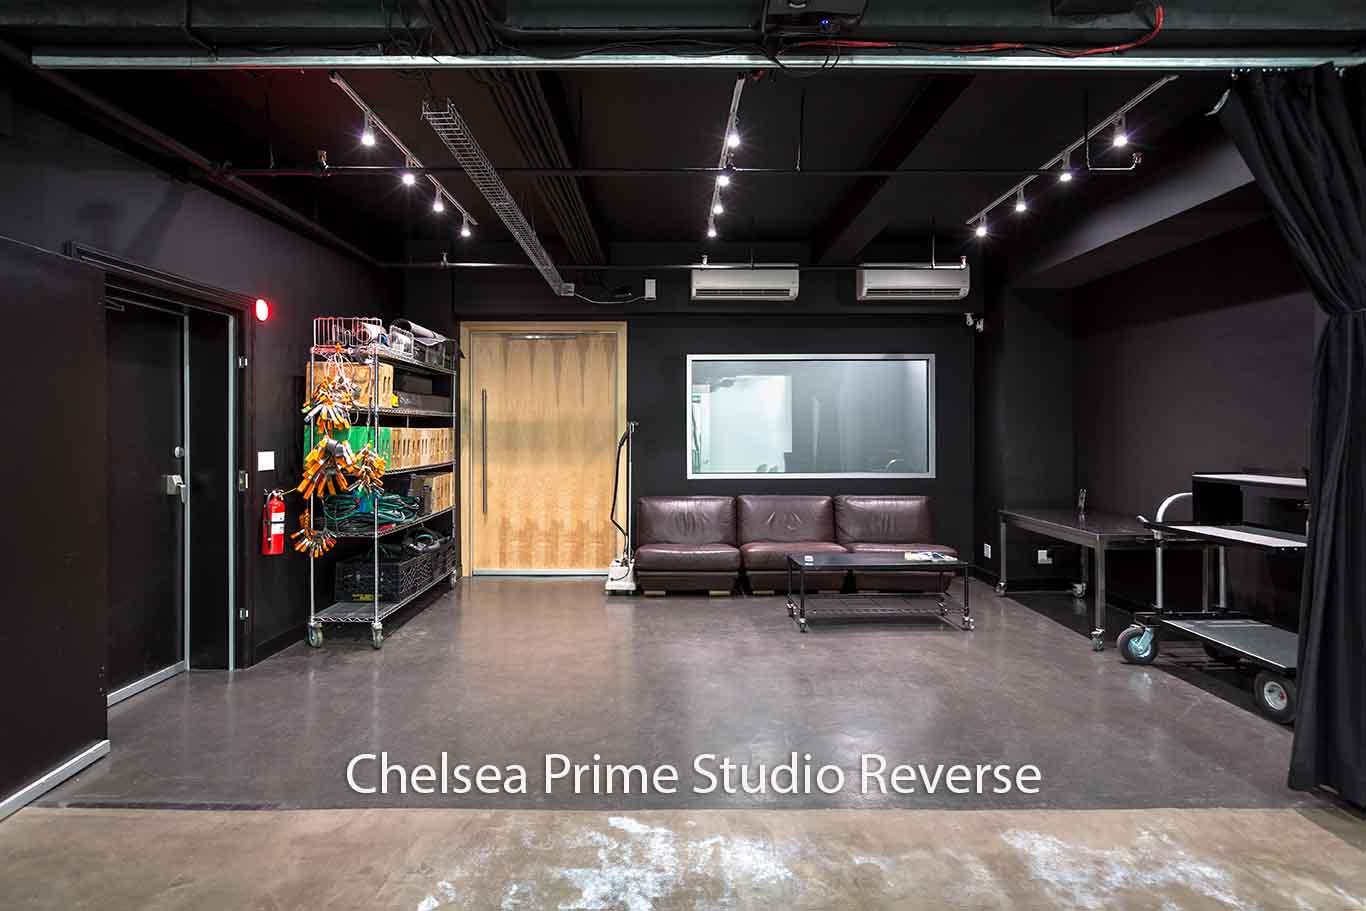 Chelsea Prime Studio Reverse